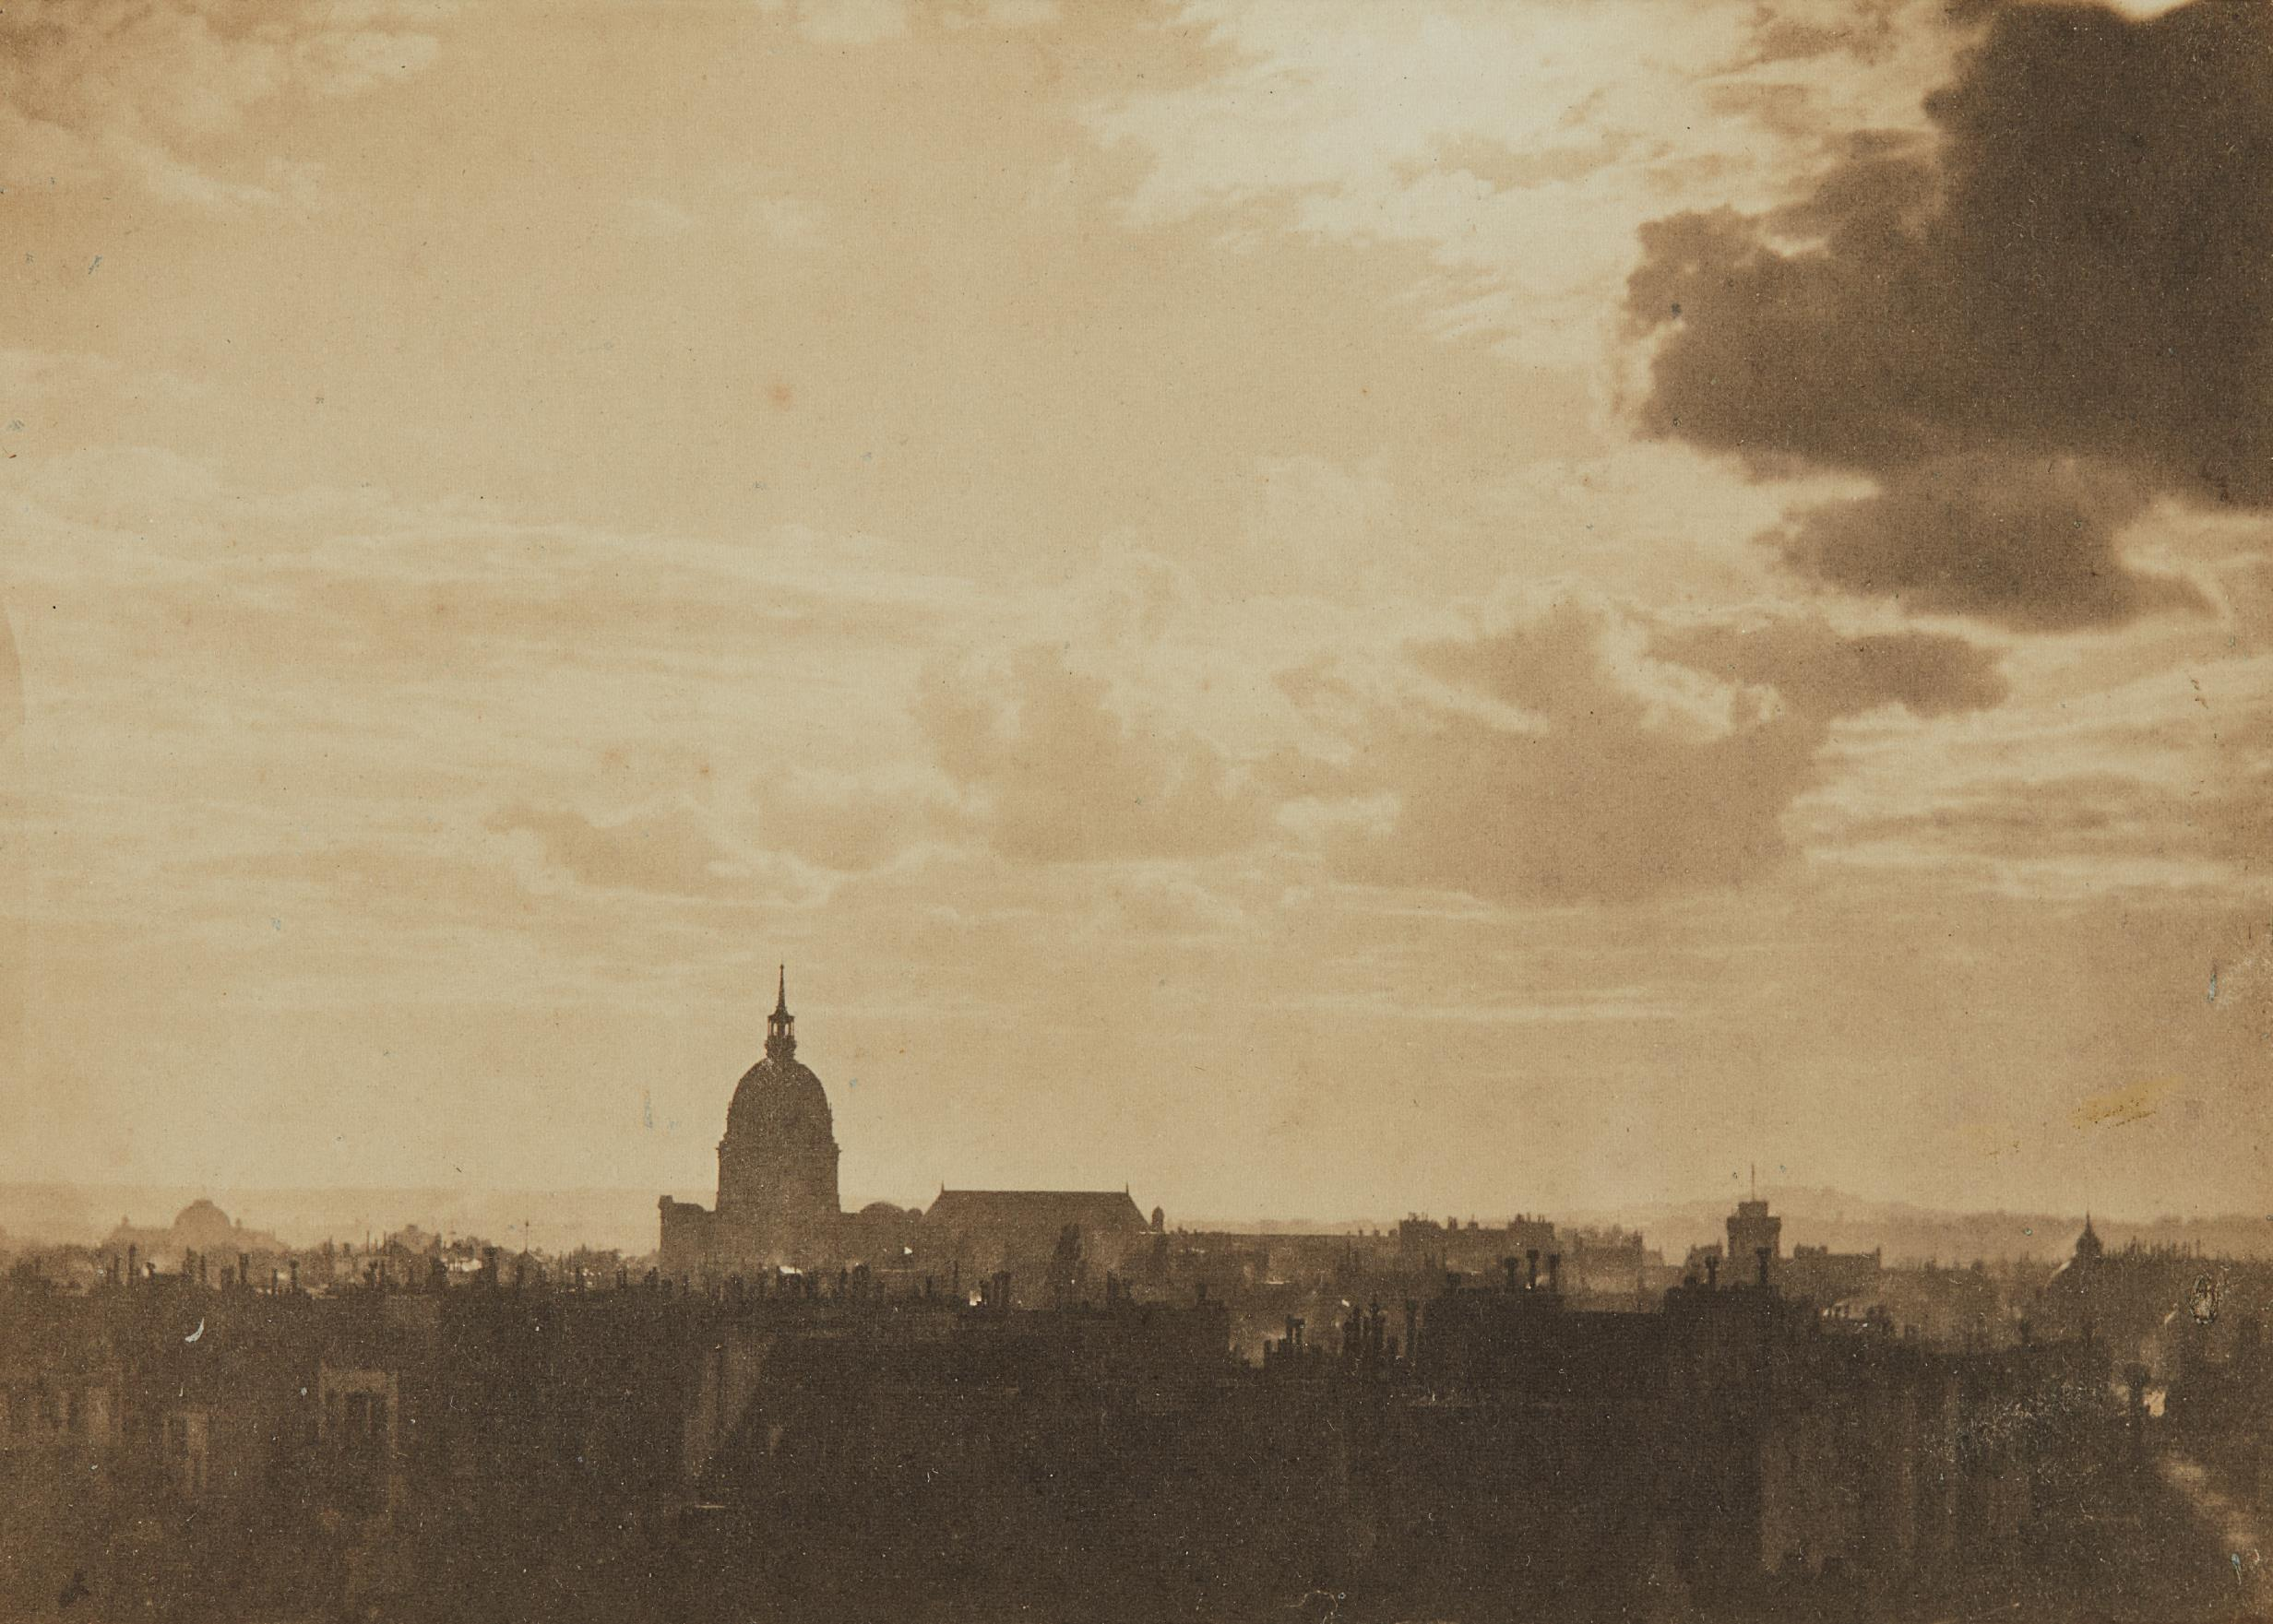 Charles Marville-Sky Study, Paris-1857